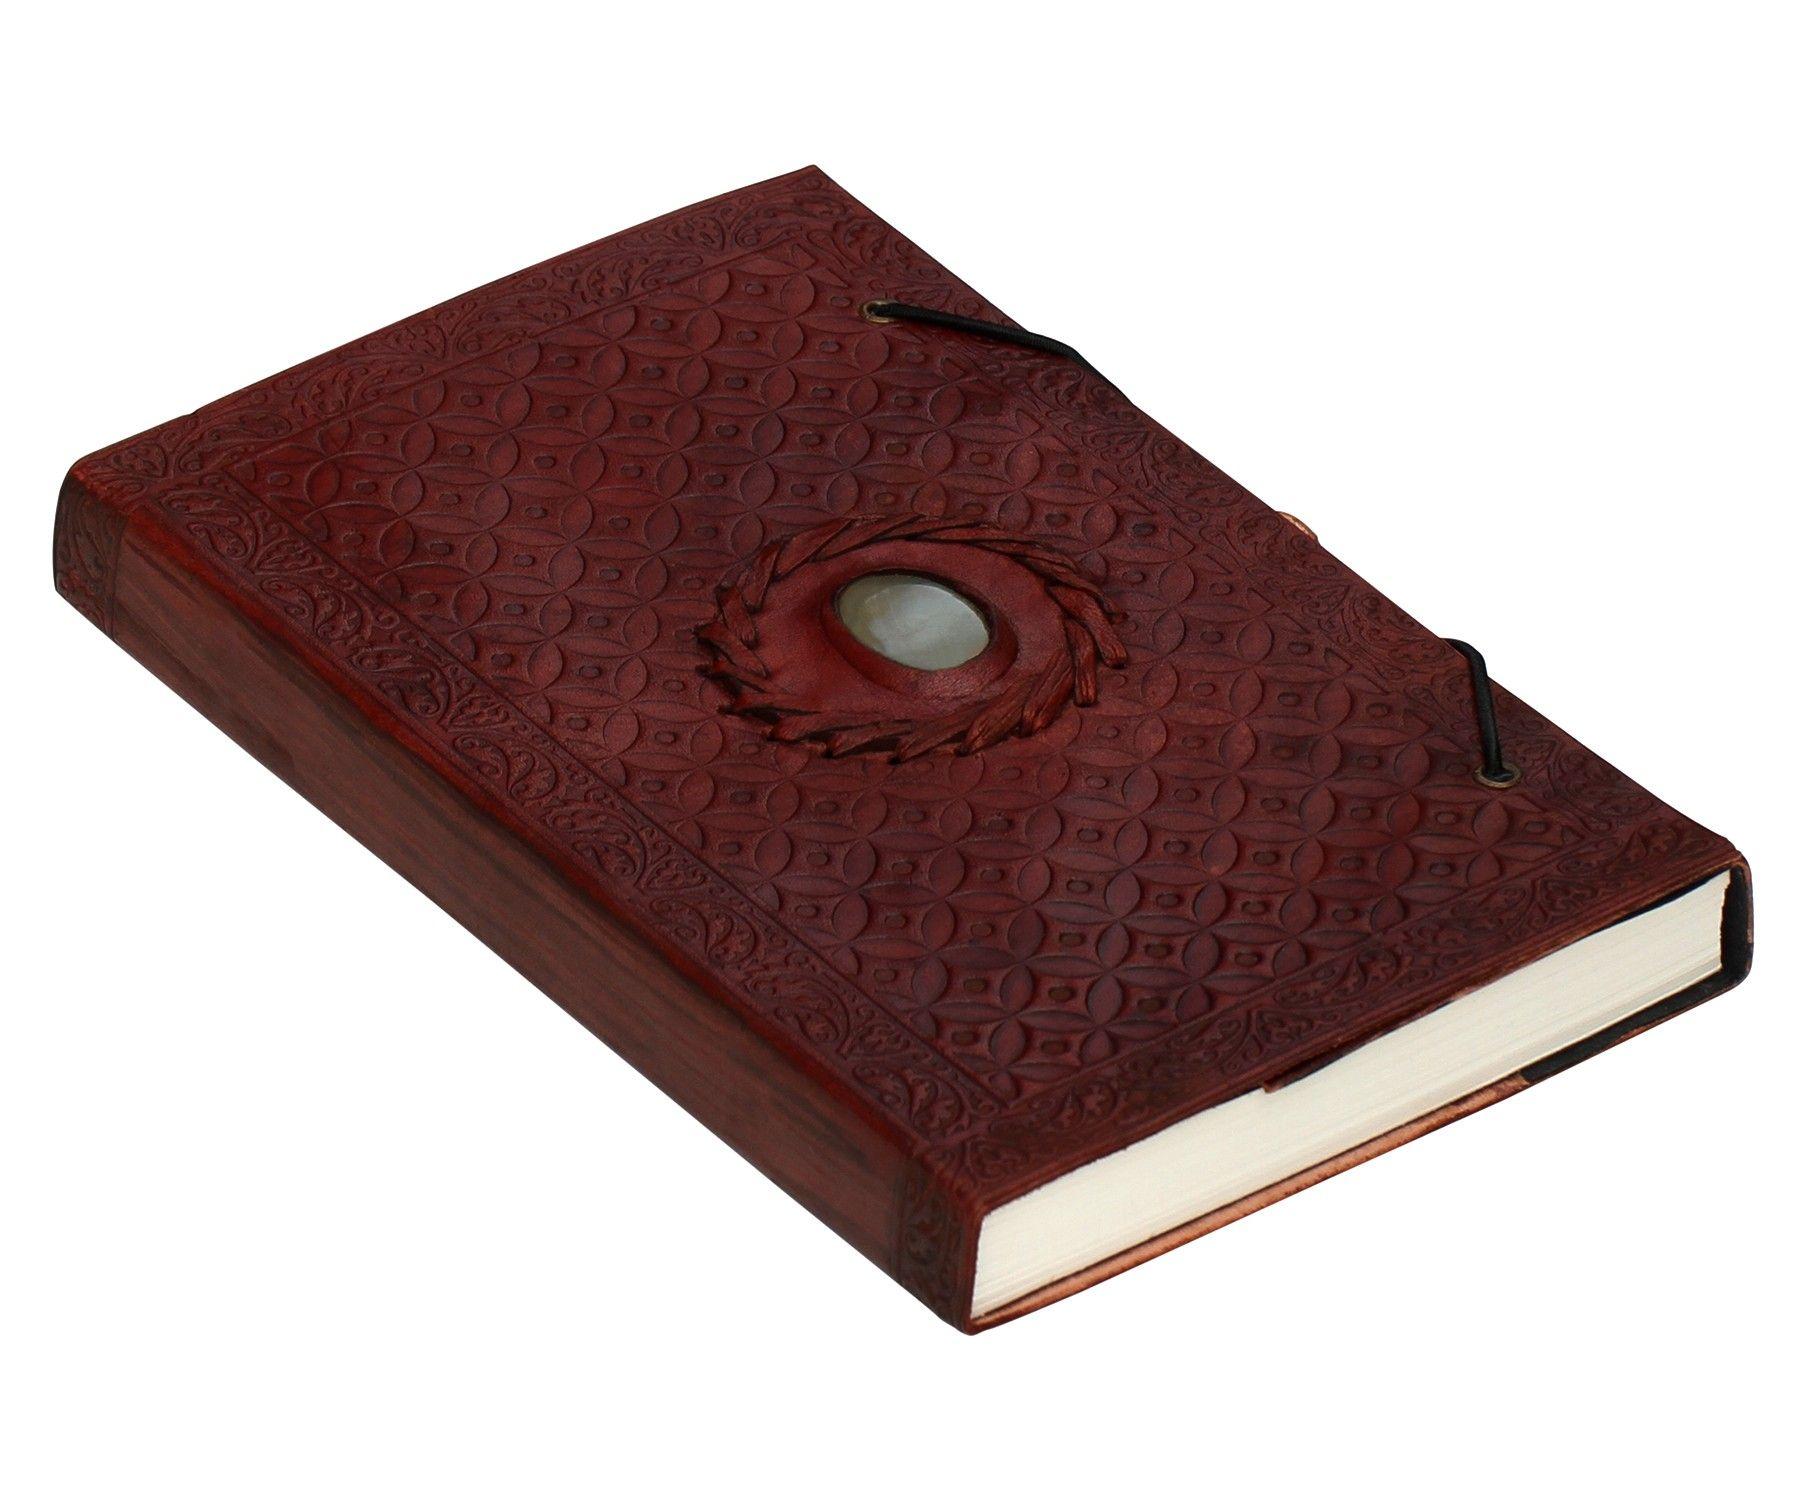 Inspirational Writings Buy Wholesale Handmade 8 5